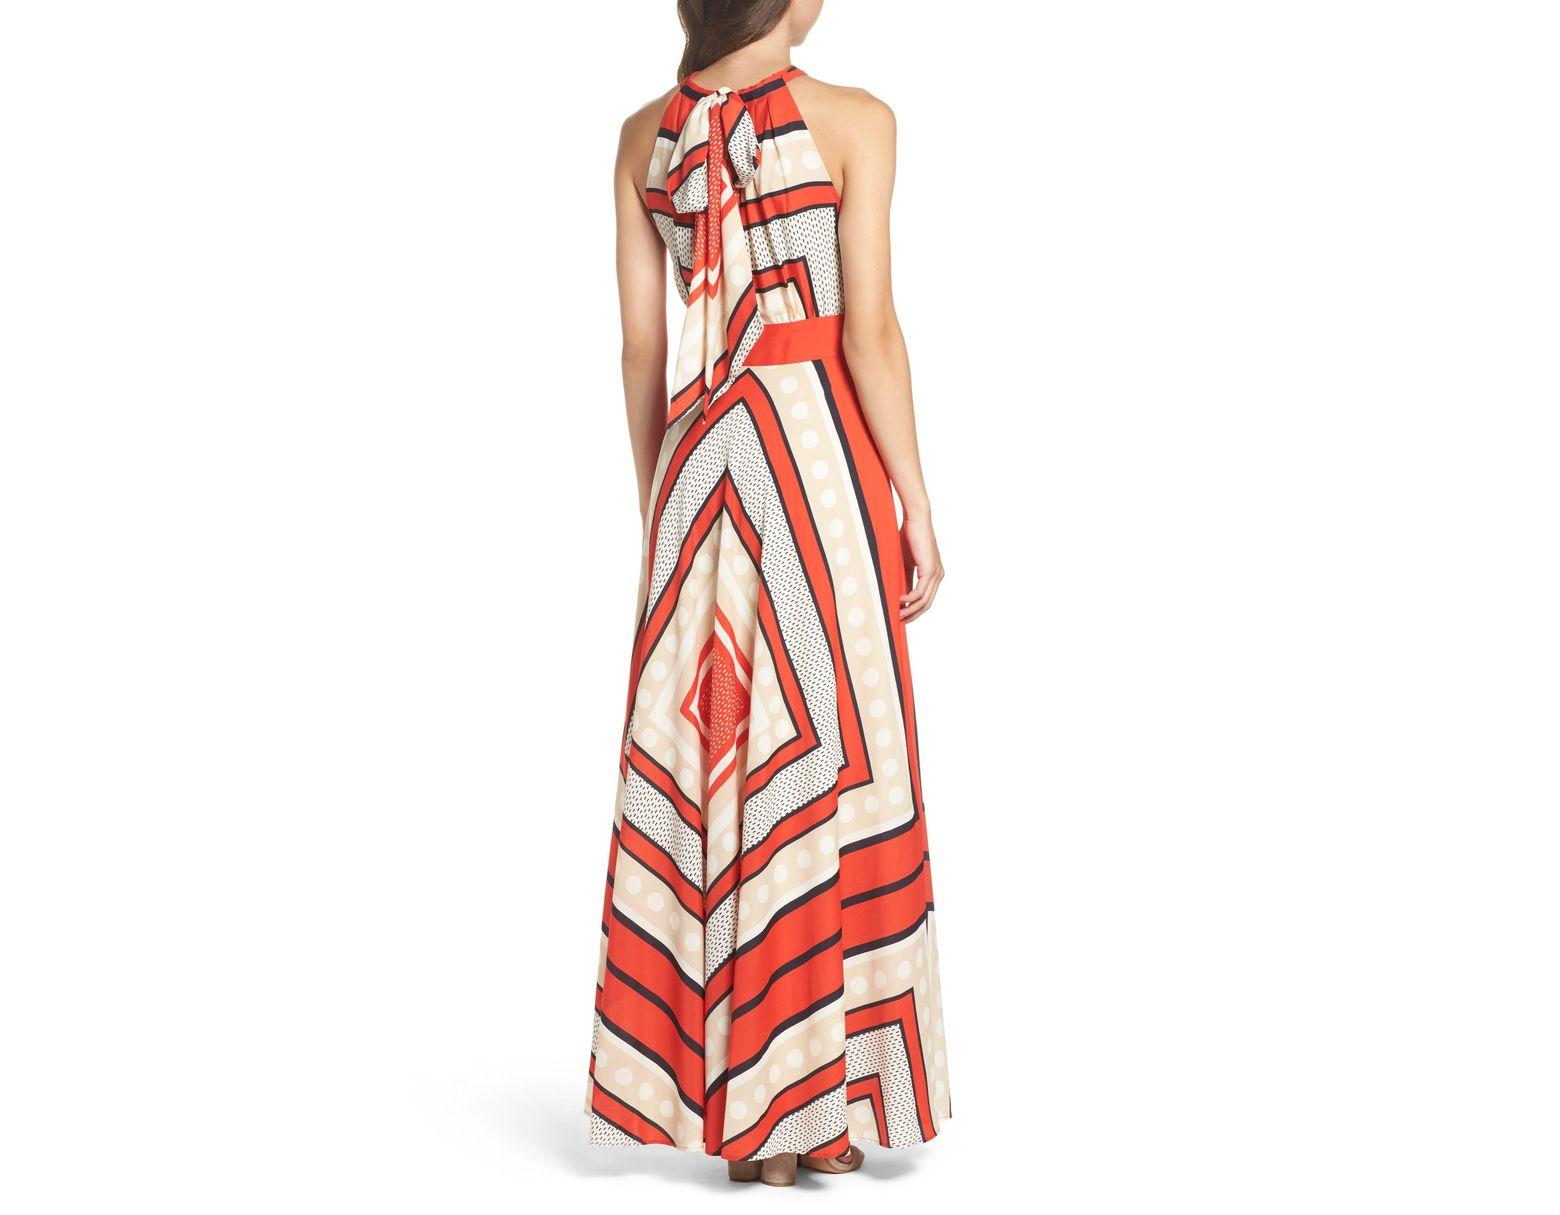 897c31ec316e5 Women's Red Halter Tie Printed Maxi Dress